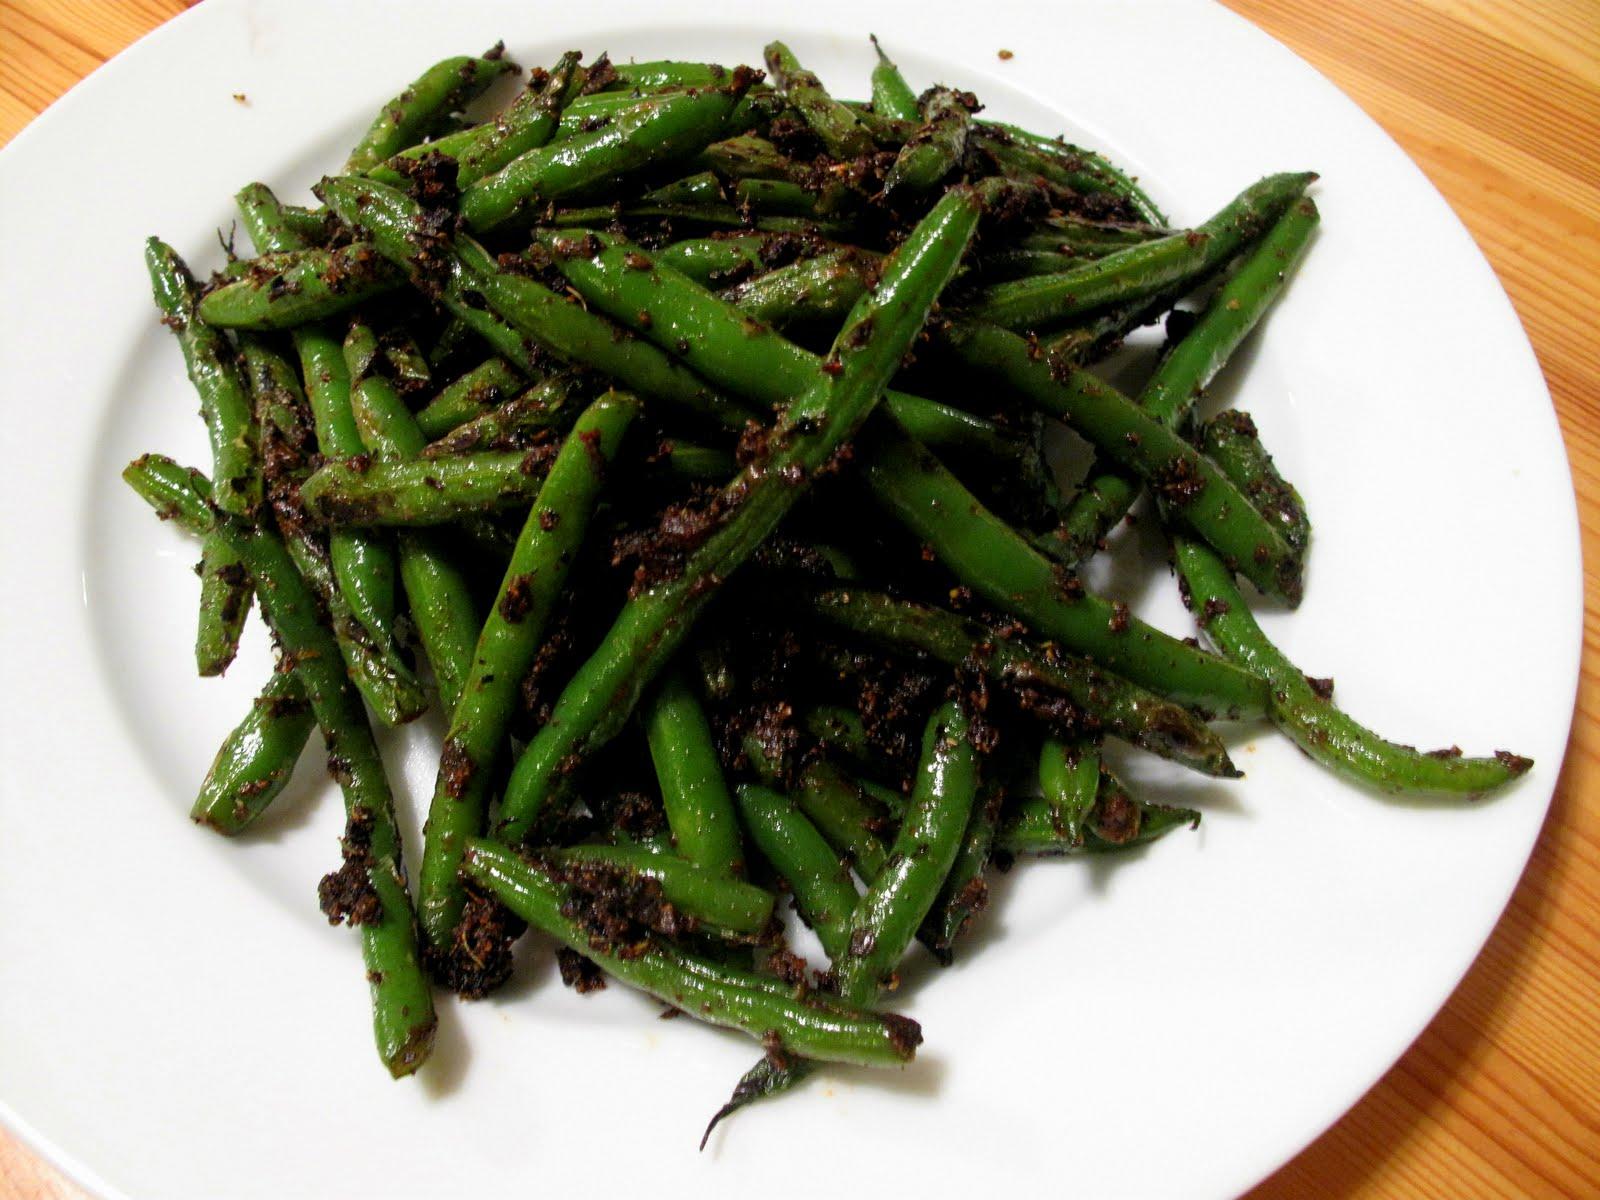 Blackened Green Bean And Quinoa Salad Recipes — Dishmaps